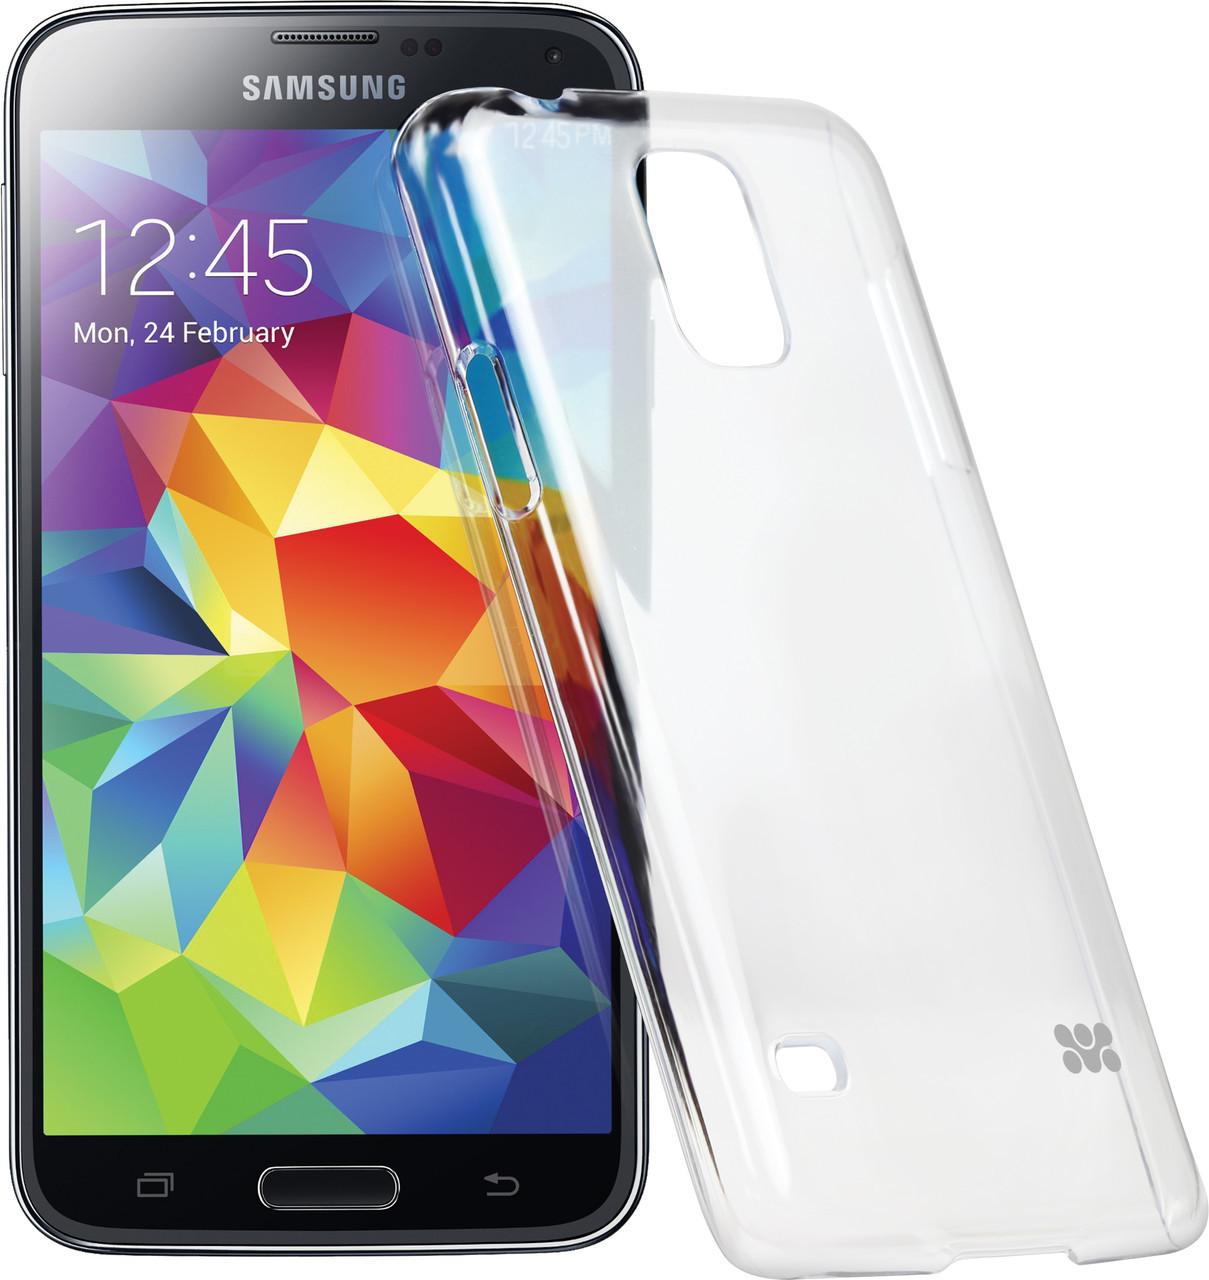 Накладка Promate Crystal-S5 для Samsung Galaxy S5 Clear